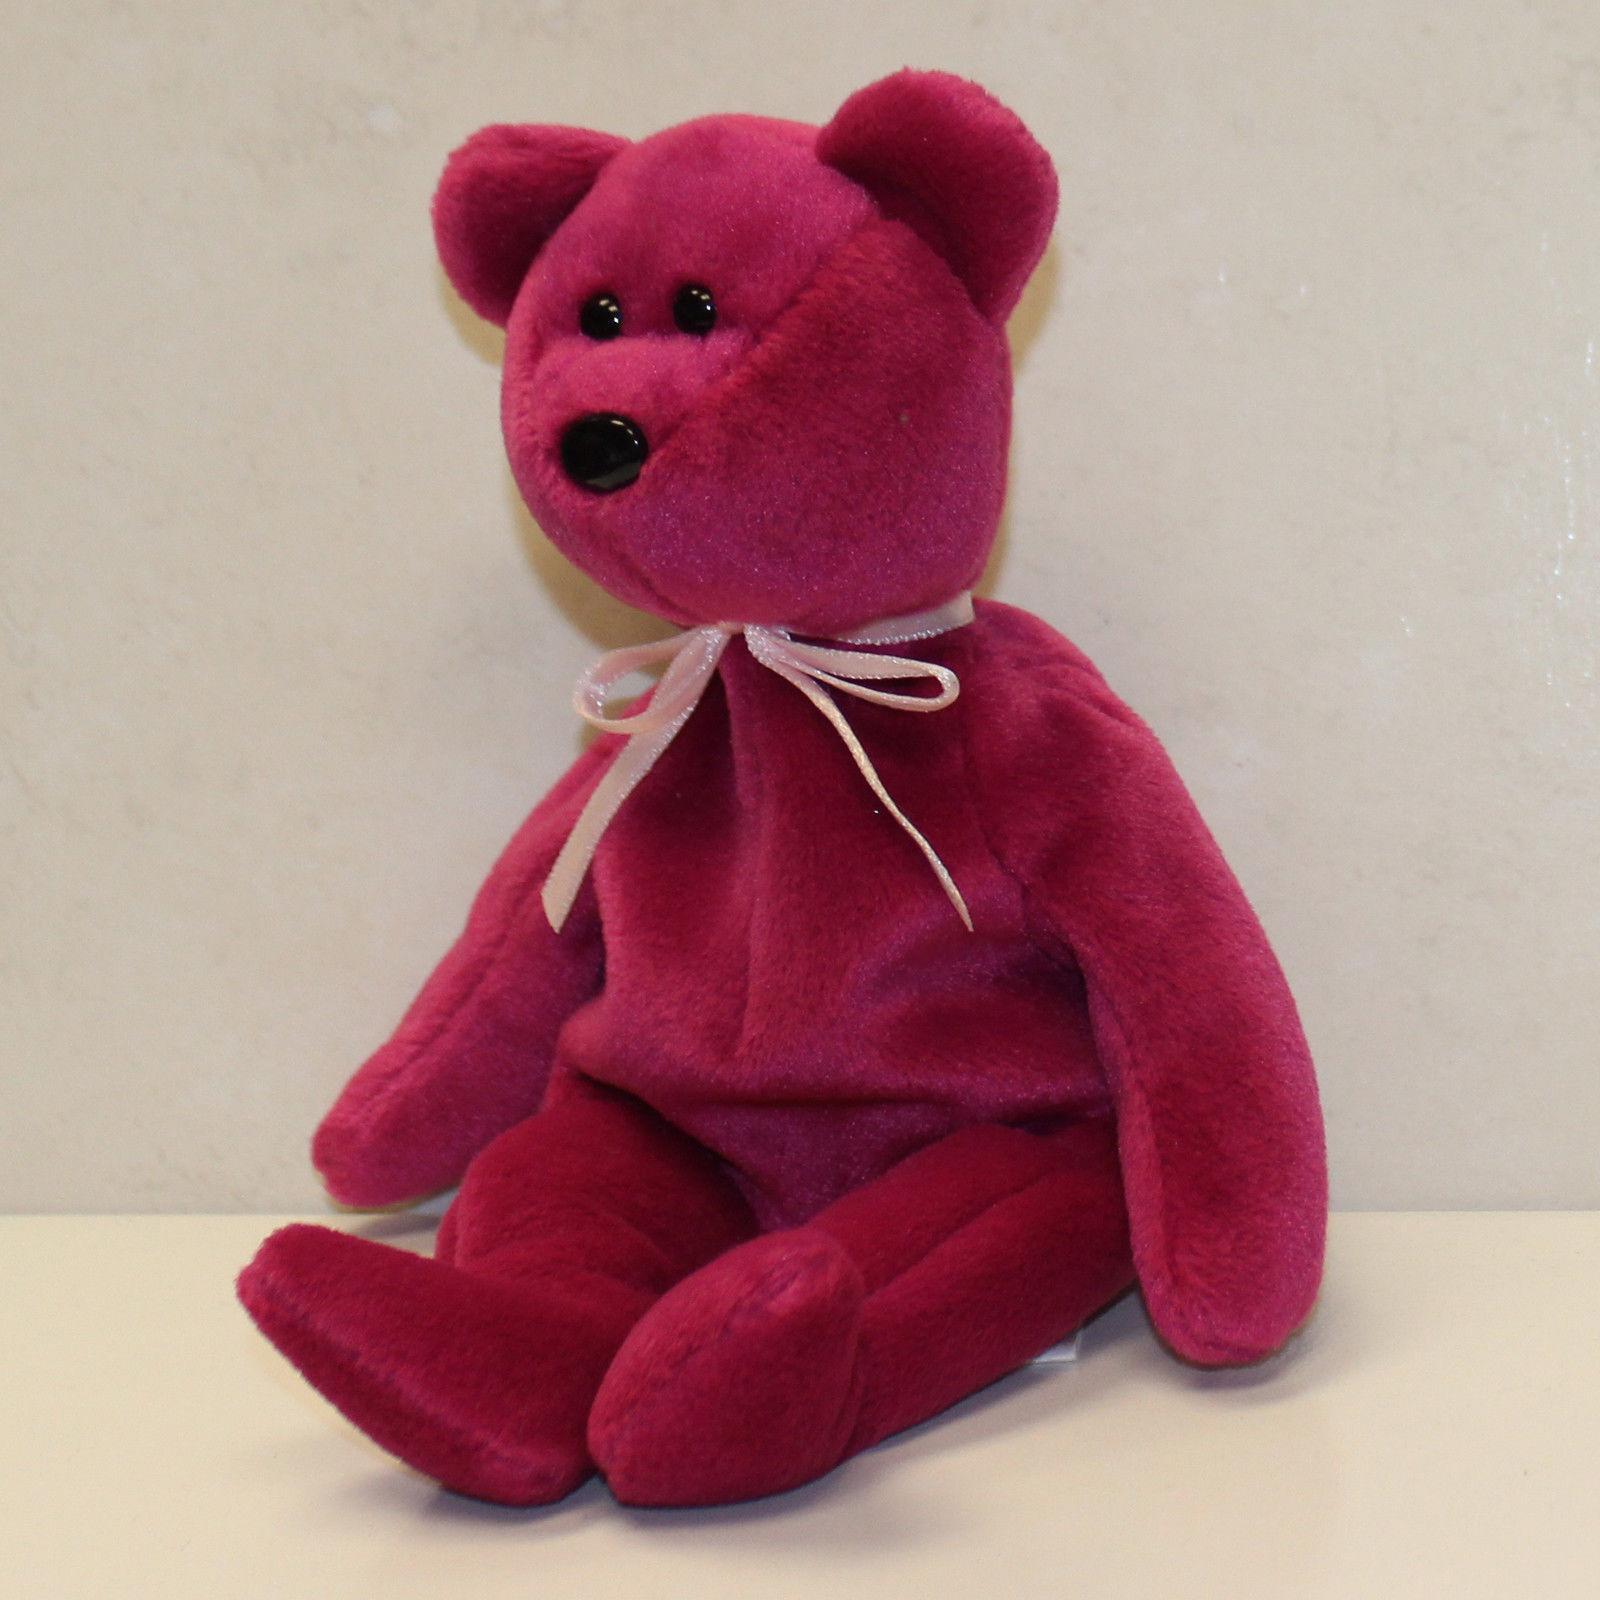 Teddy nf magenta - nht - 1 gen hintern - tag - ty beanie baby (sp)